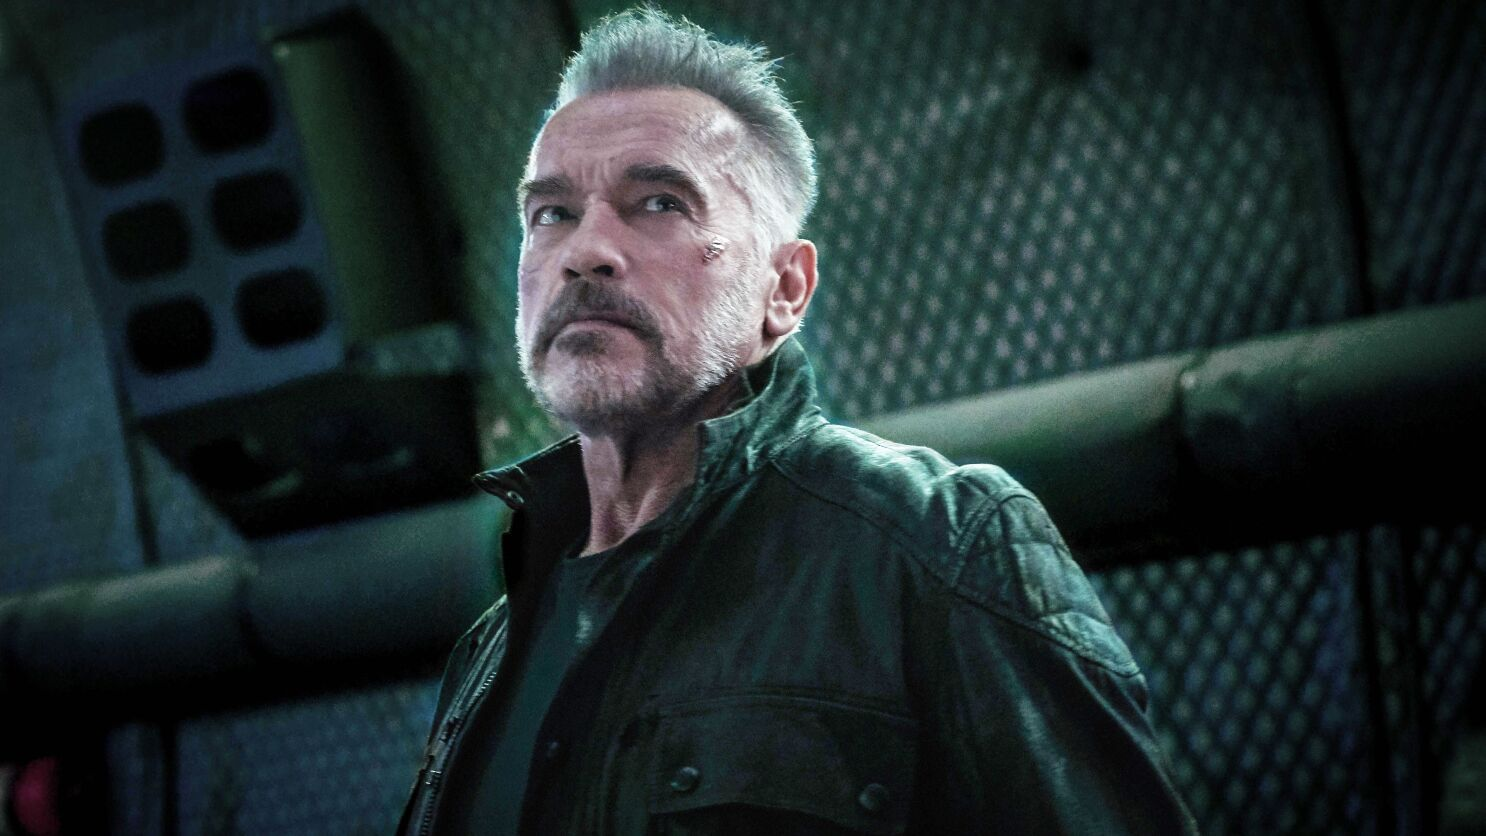 Comic-Con: Yes, the R-rated 'Terminator: Dark Fate' will include Eddie Furlong and Linda Hamilton